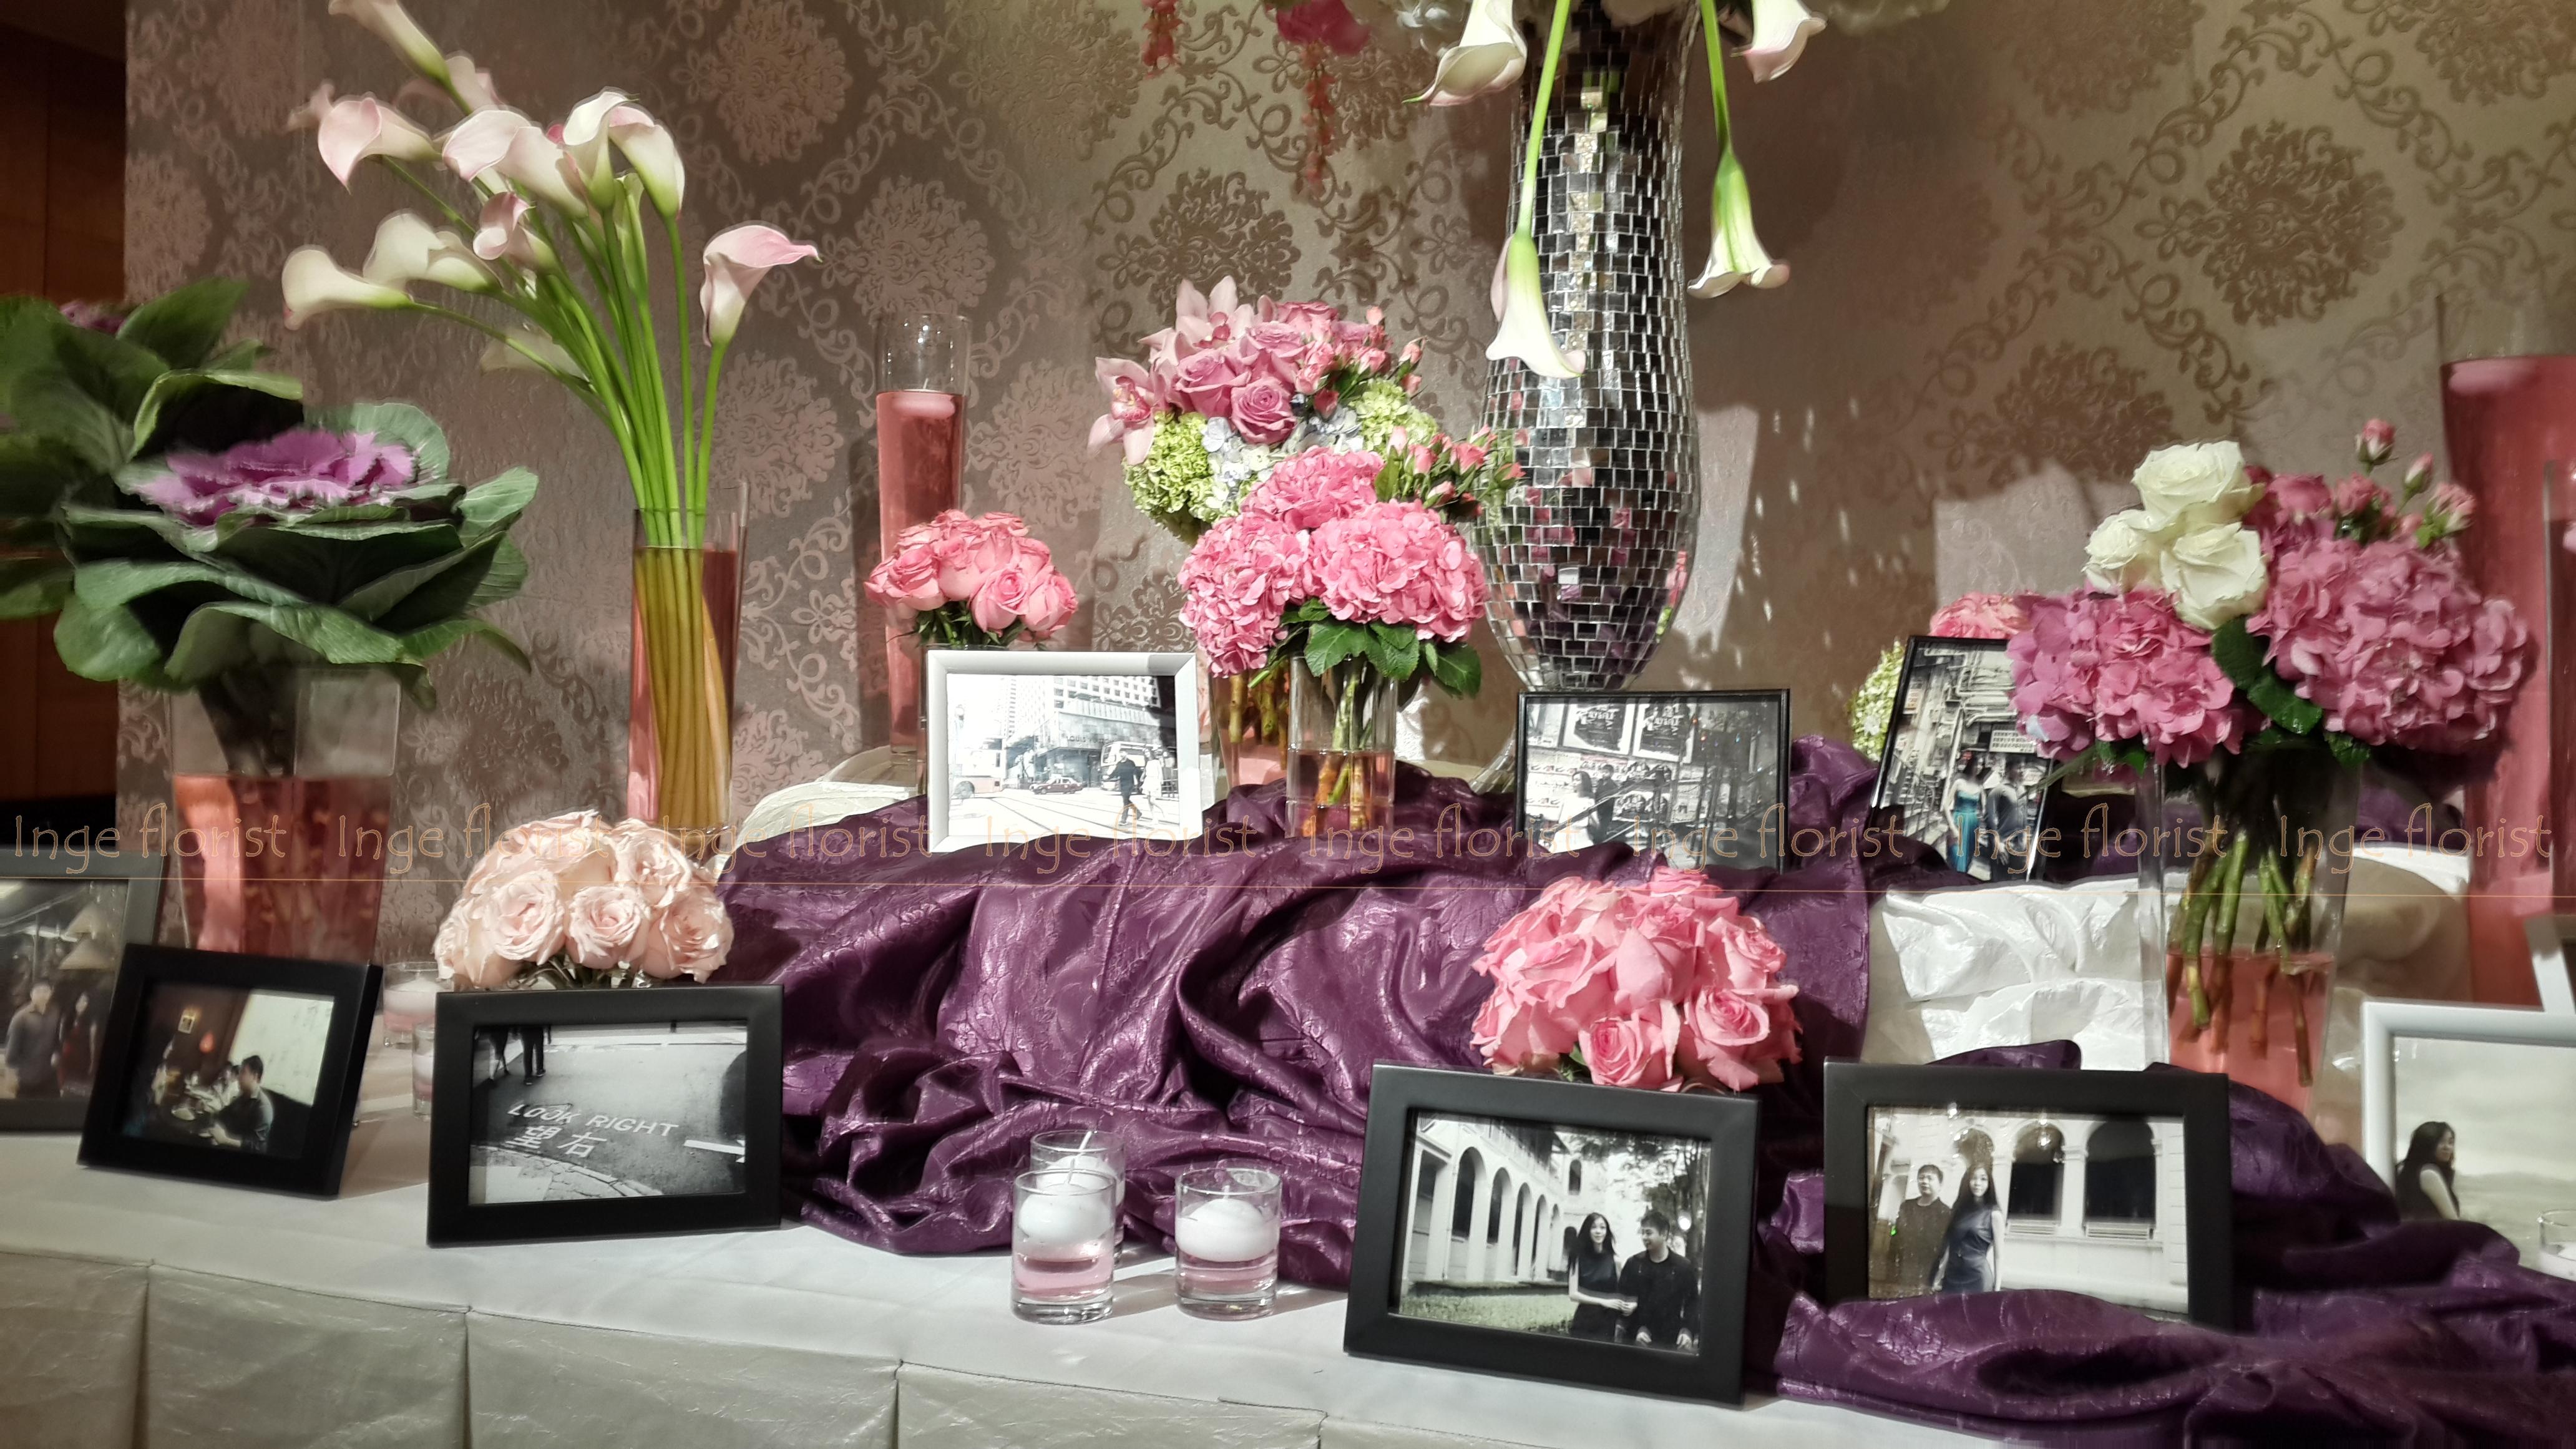 Gallery Photo Photo Booth Inge Florist Wedding Decoration